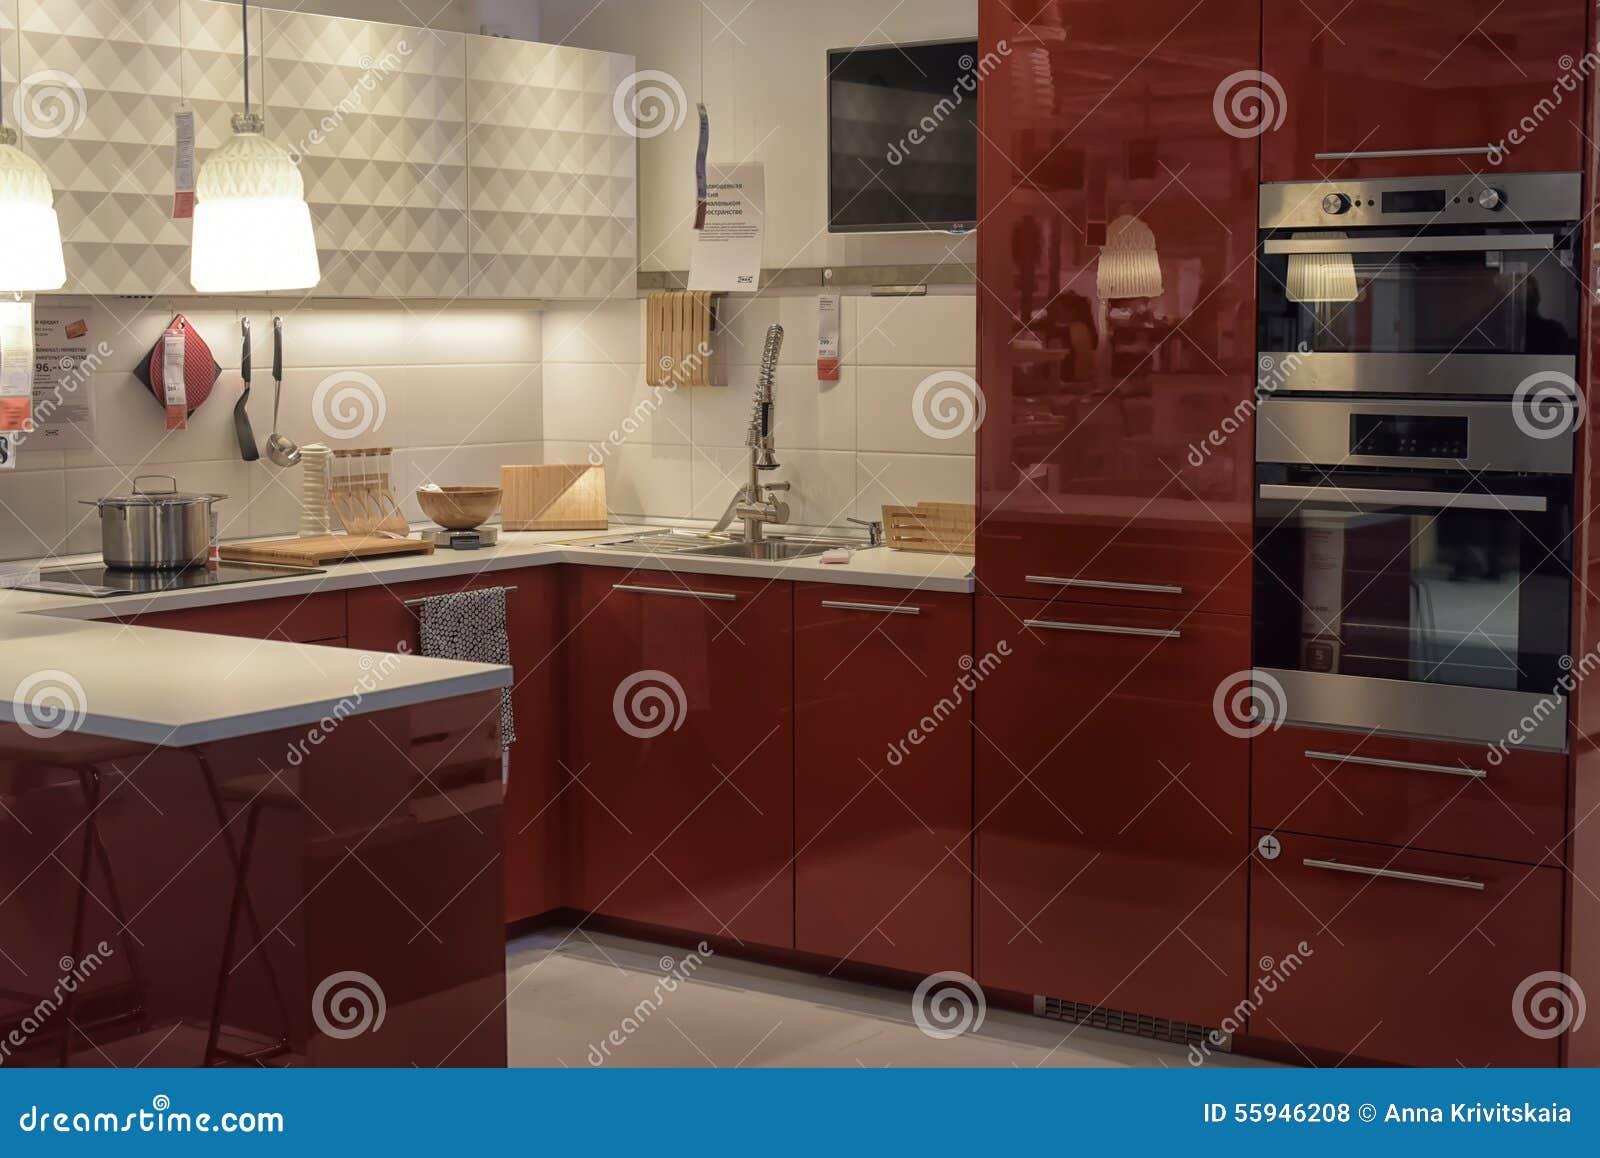 Mobili Ikea Cucina : Cucina in negozio di mobili ikea fotografia stock editoriale